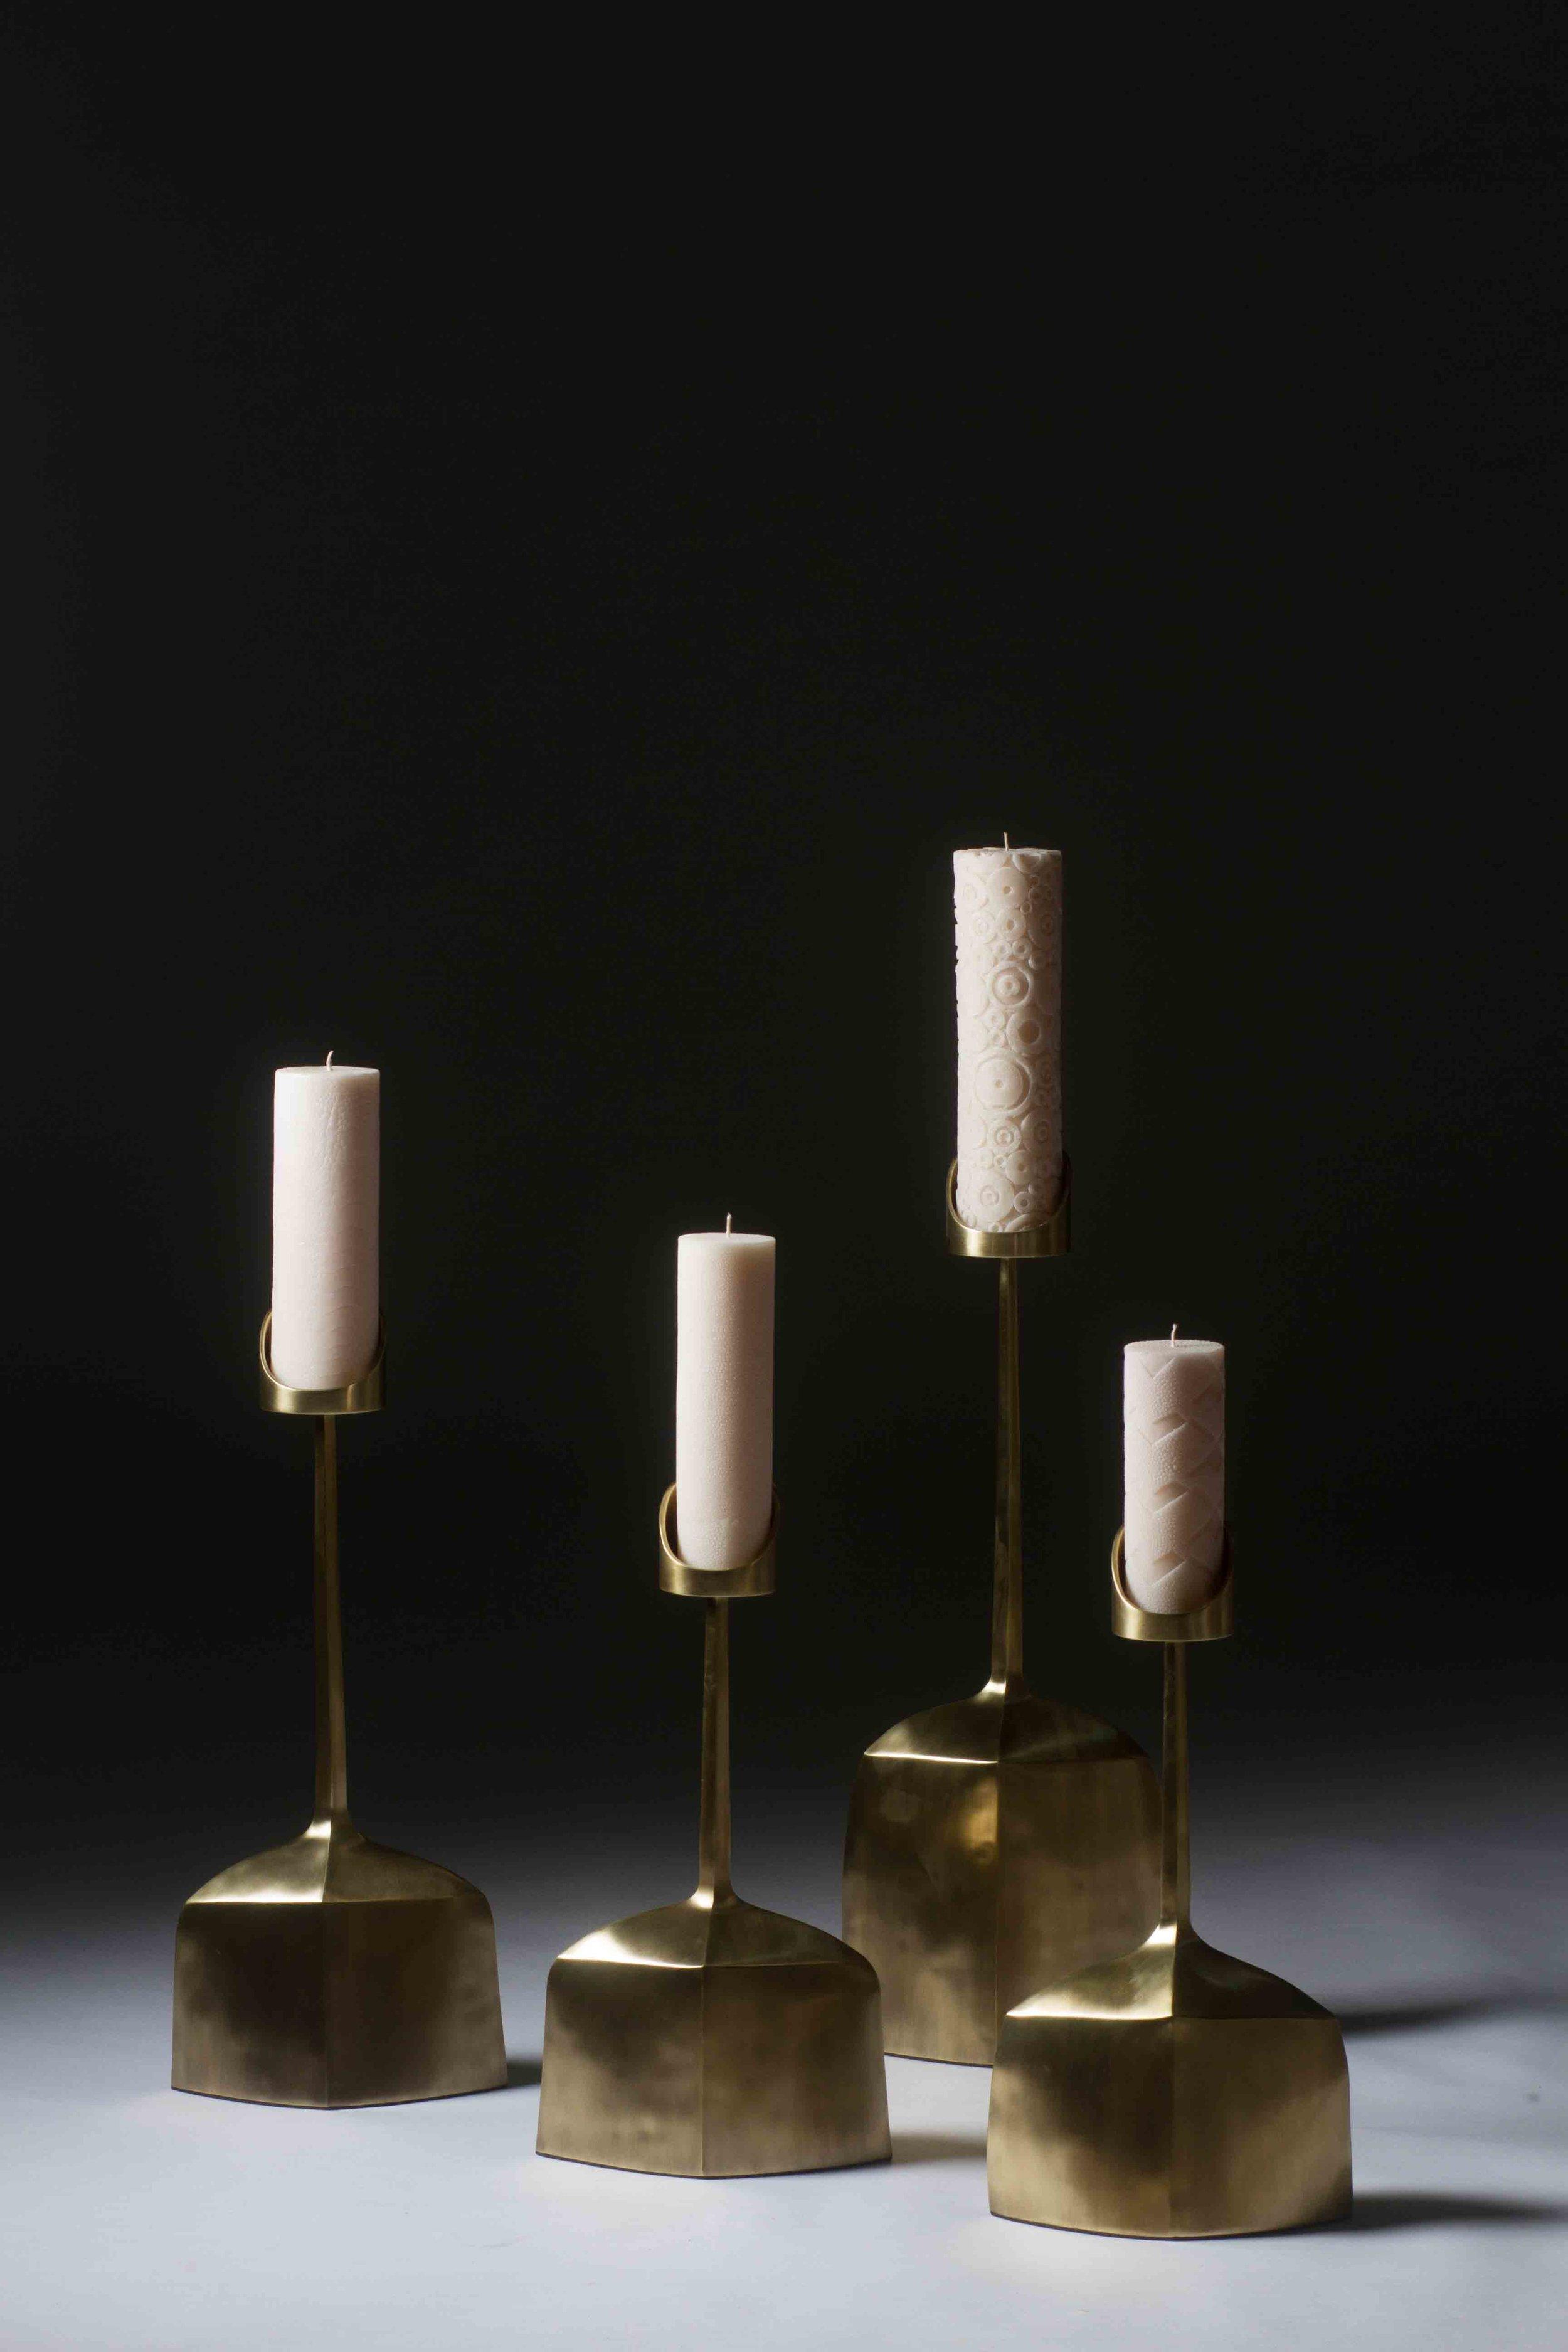 paris-sculptual-candles-.jpg